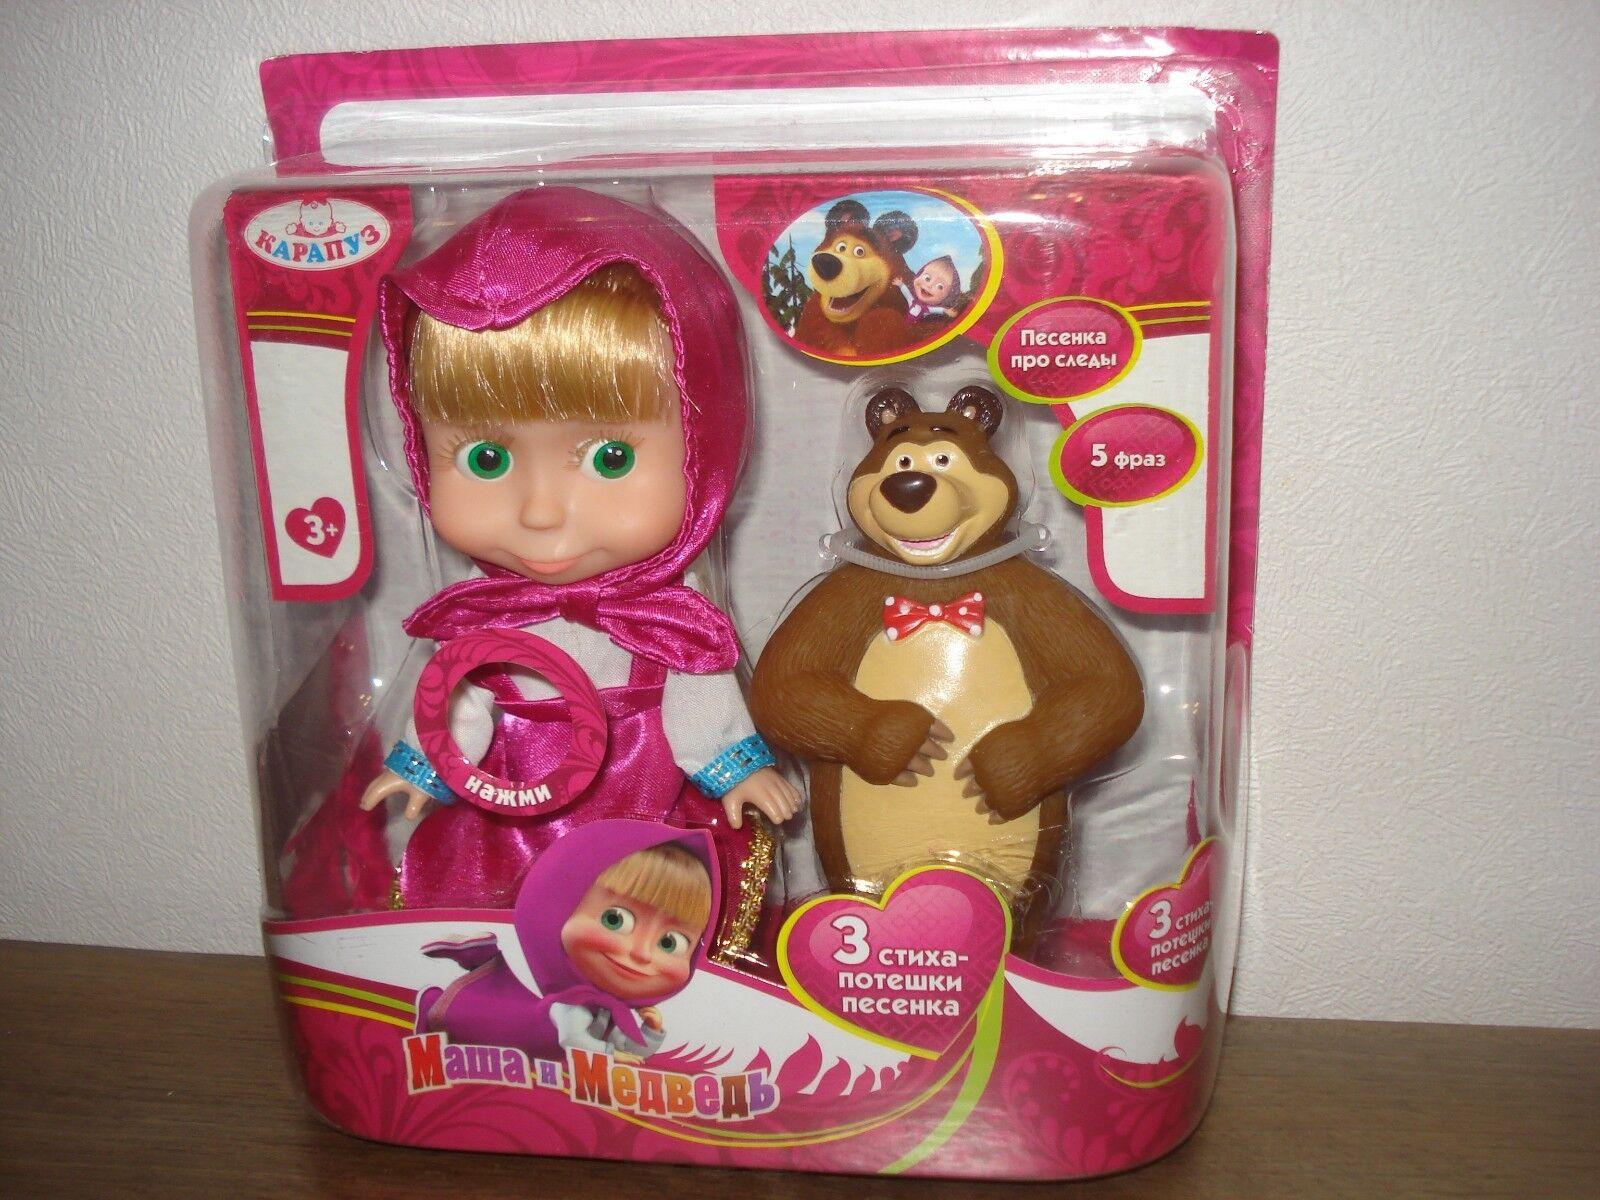 Doll Masha Masha Masha 15 cm and the Bear from Russian cartoon Masha and Bear Masha i Medved 472c90